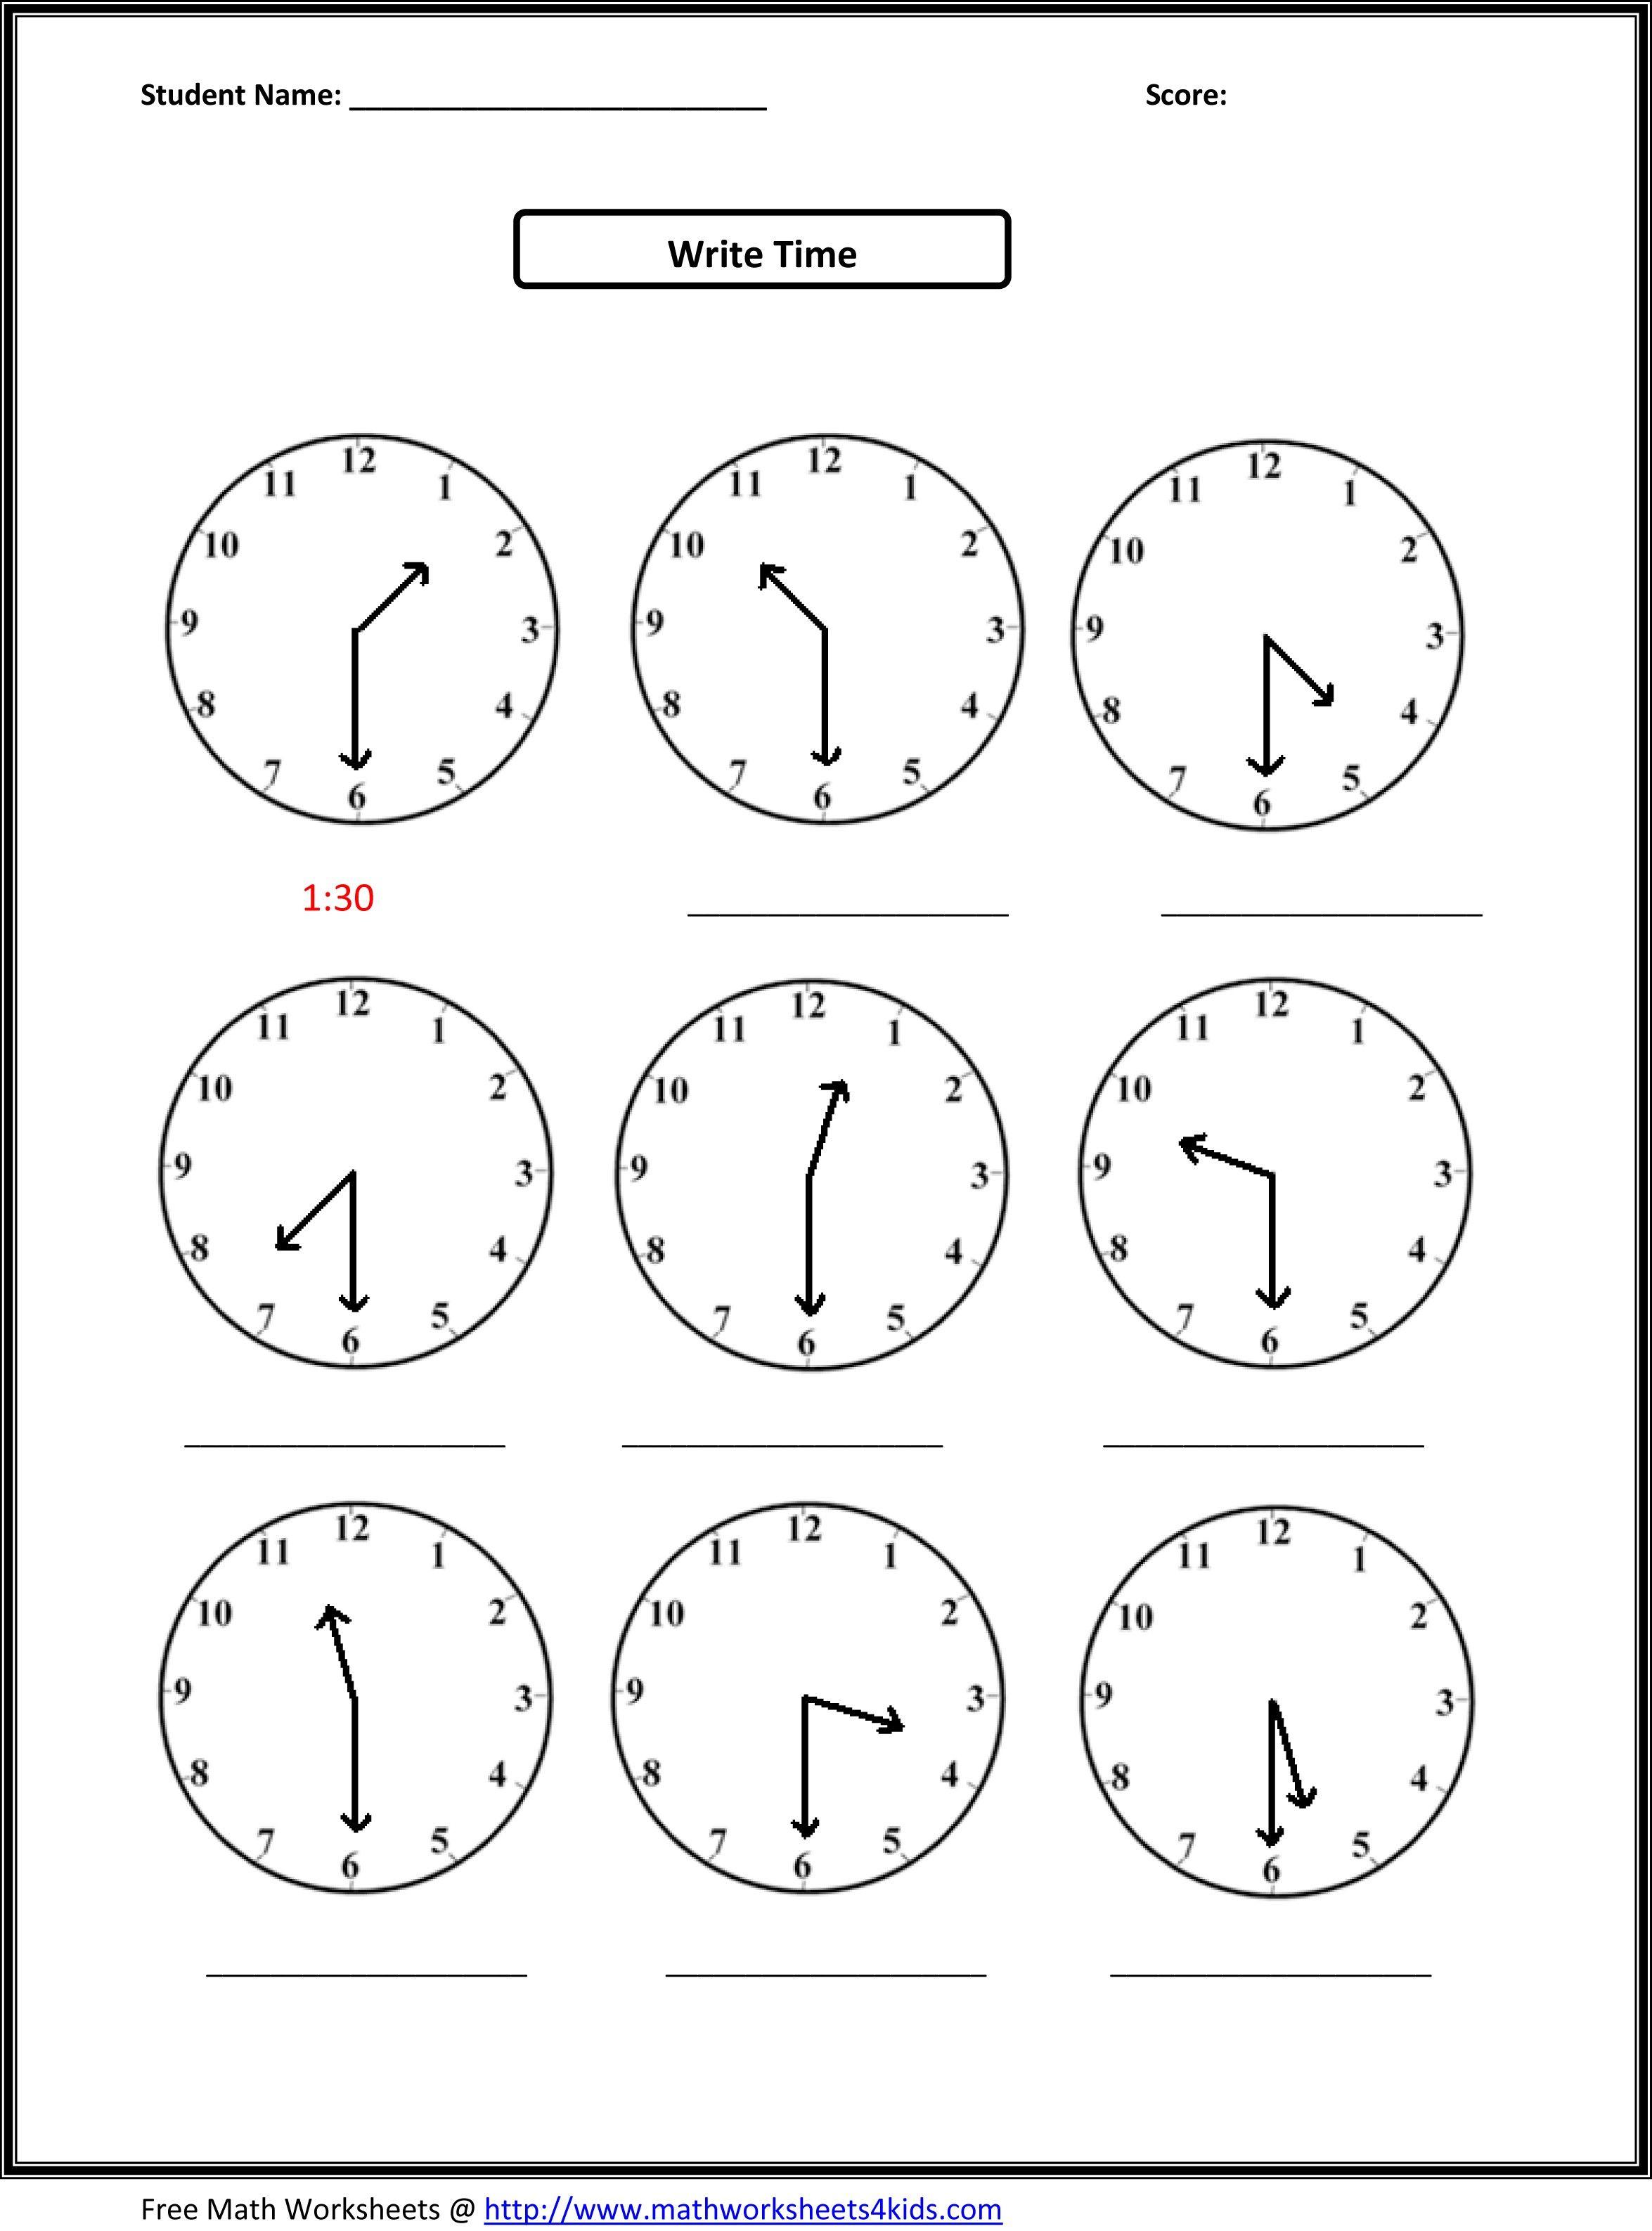 2Nd Grade Free Worksheets Math | Math: Time/measurement | 2Nd Grade | Free Printable Second Grade Writing Worksheets